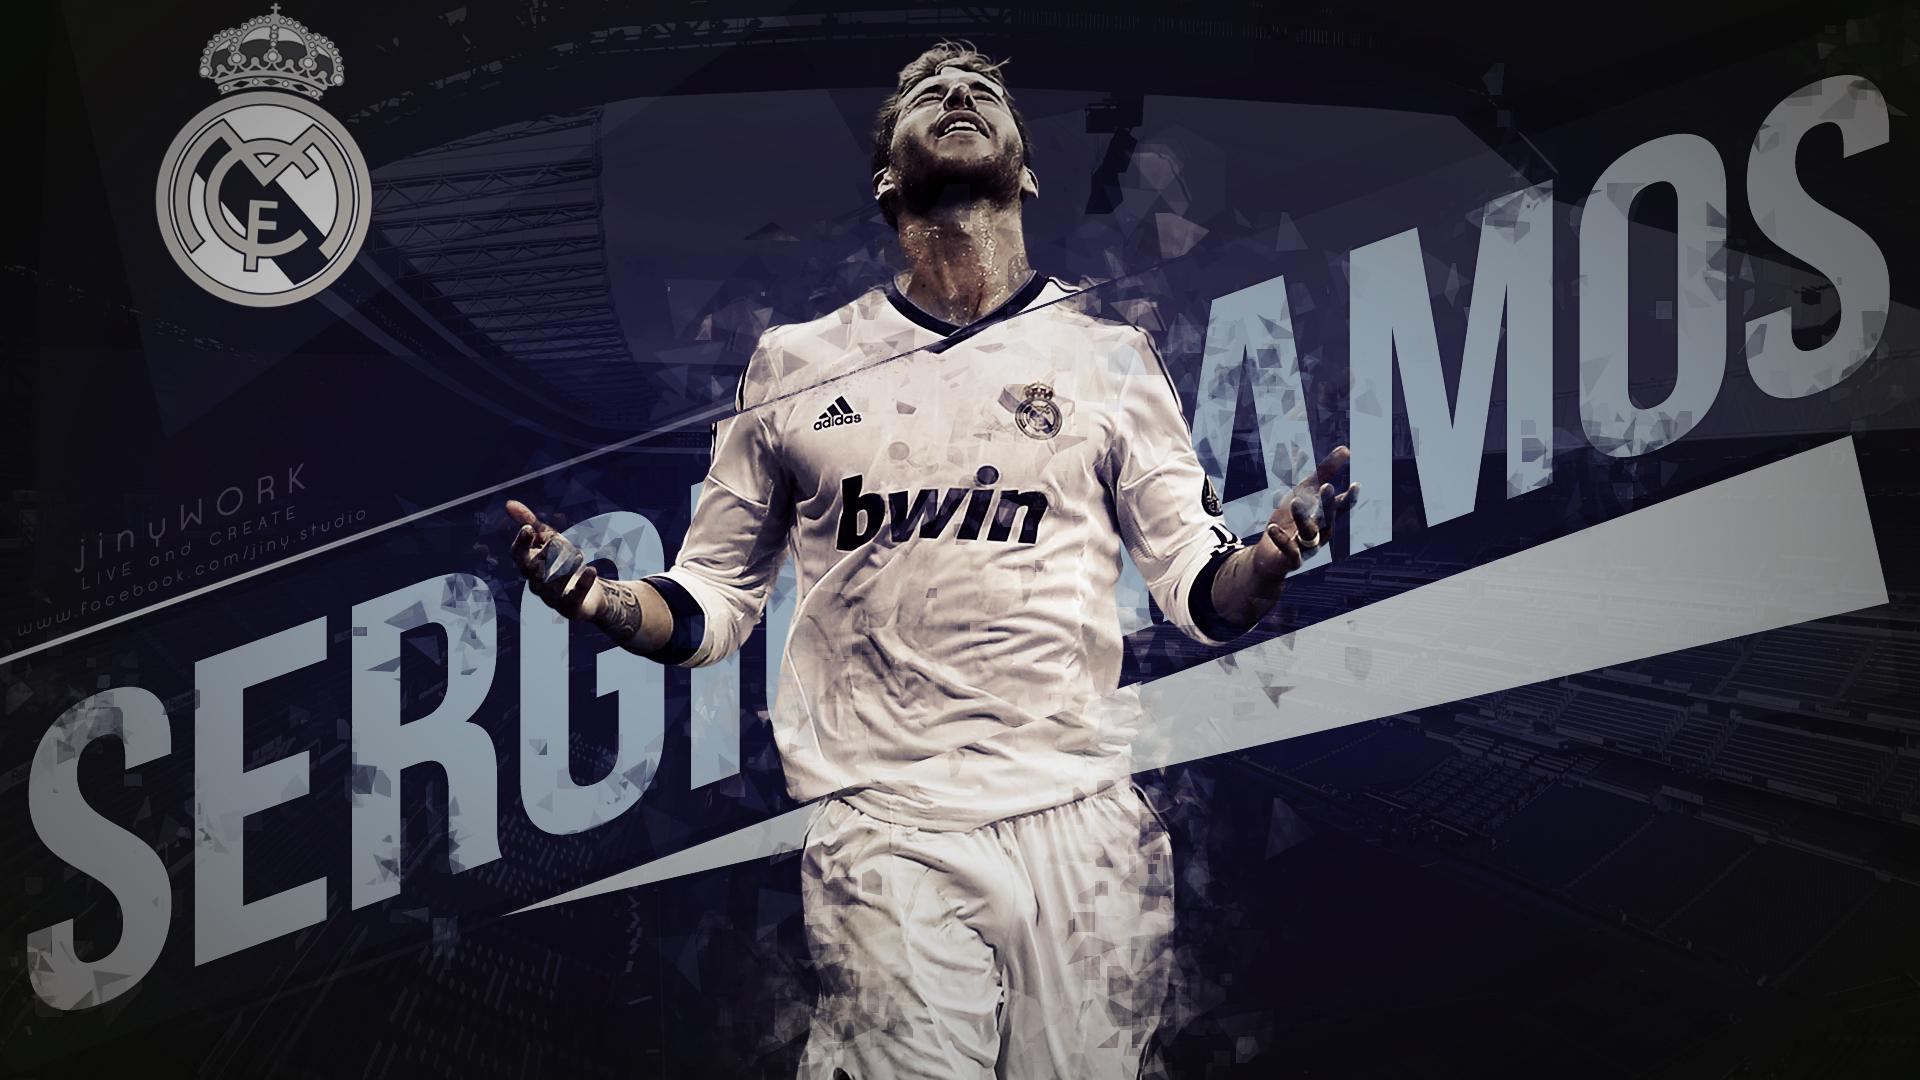 Sergio Ramos Real Madrid Wallpaper 7024293 1920x1080